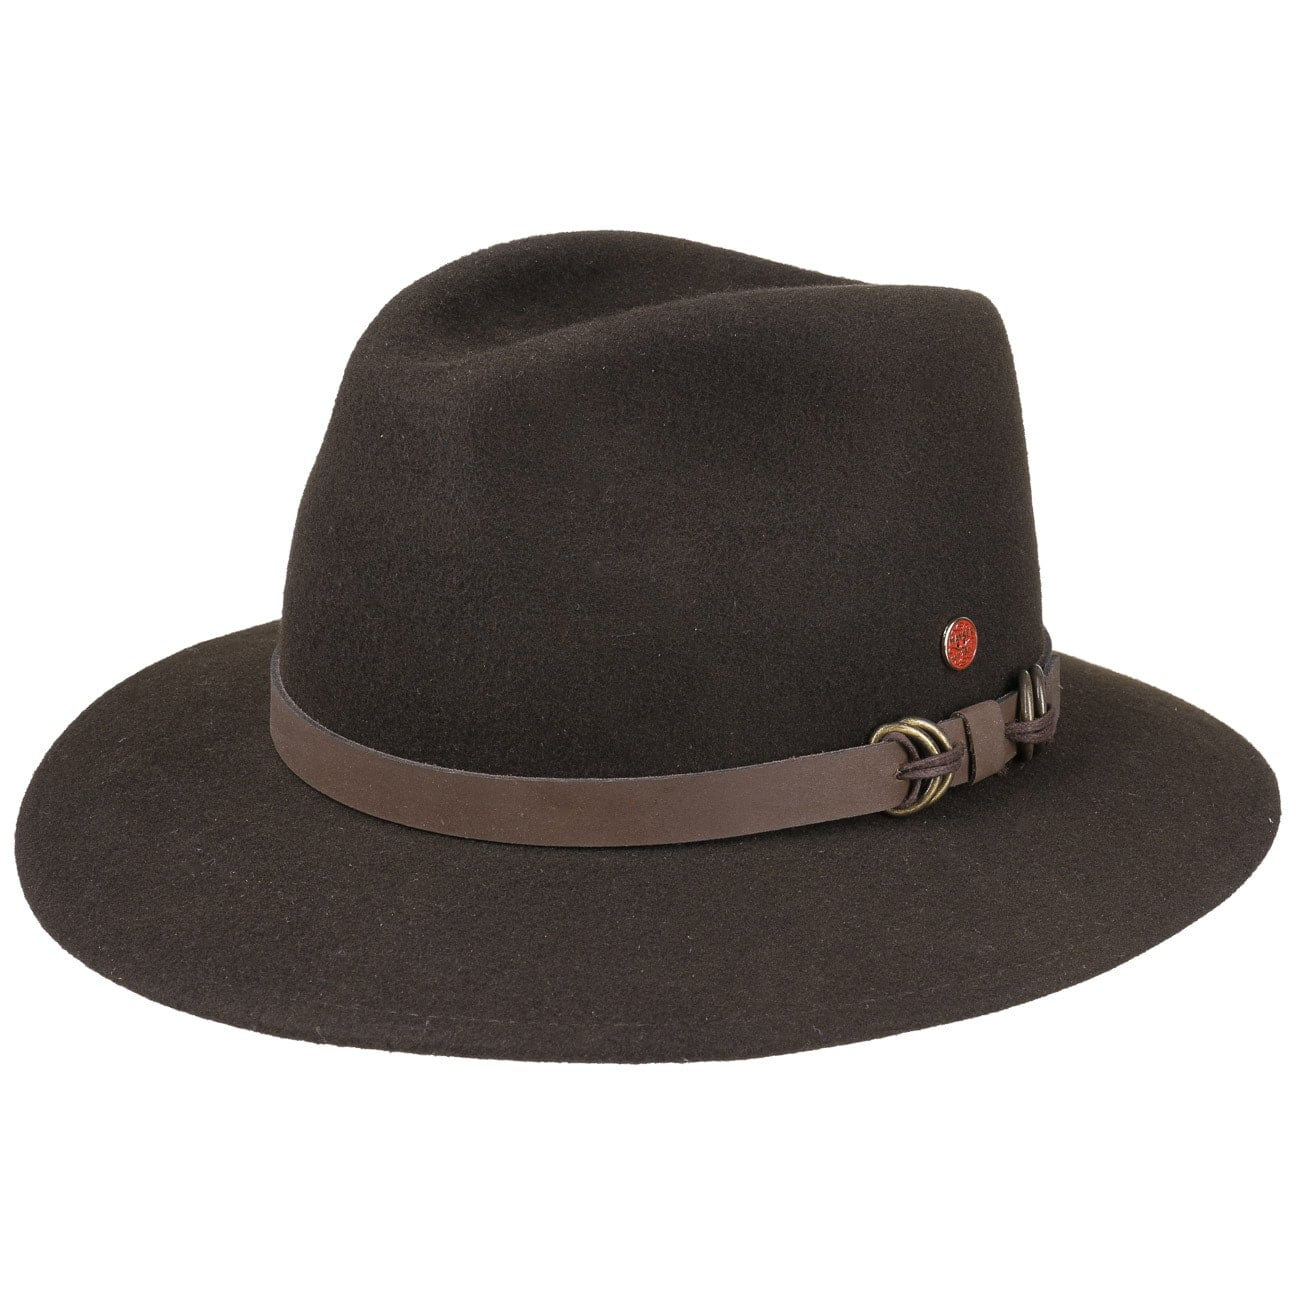 Chapeau Outdoor Baron Georgia by Mayser  chapeau malléable